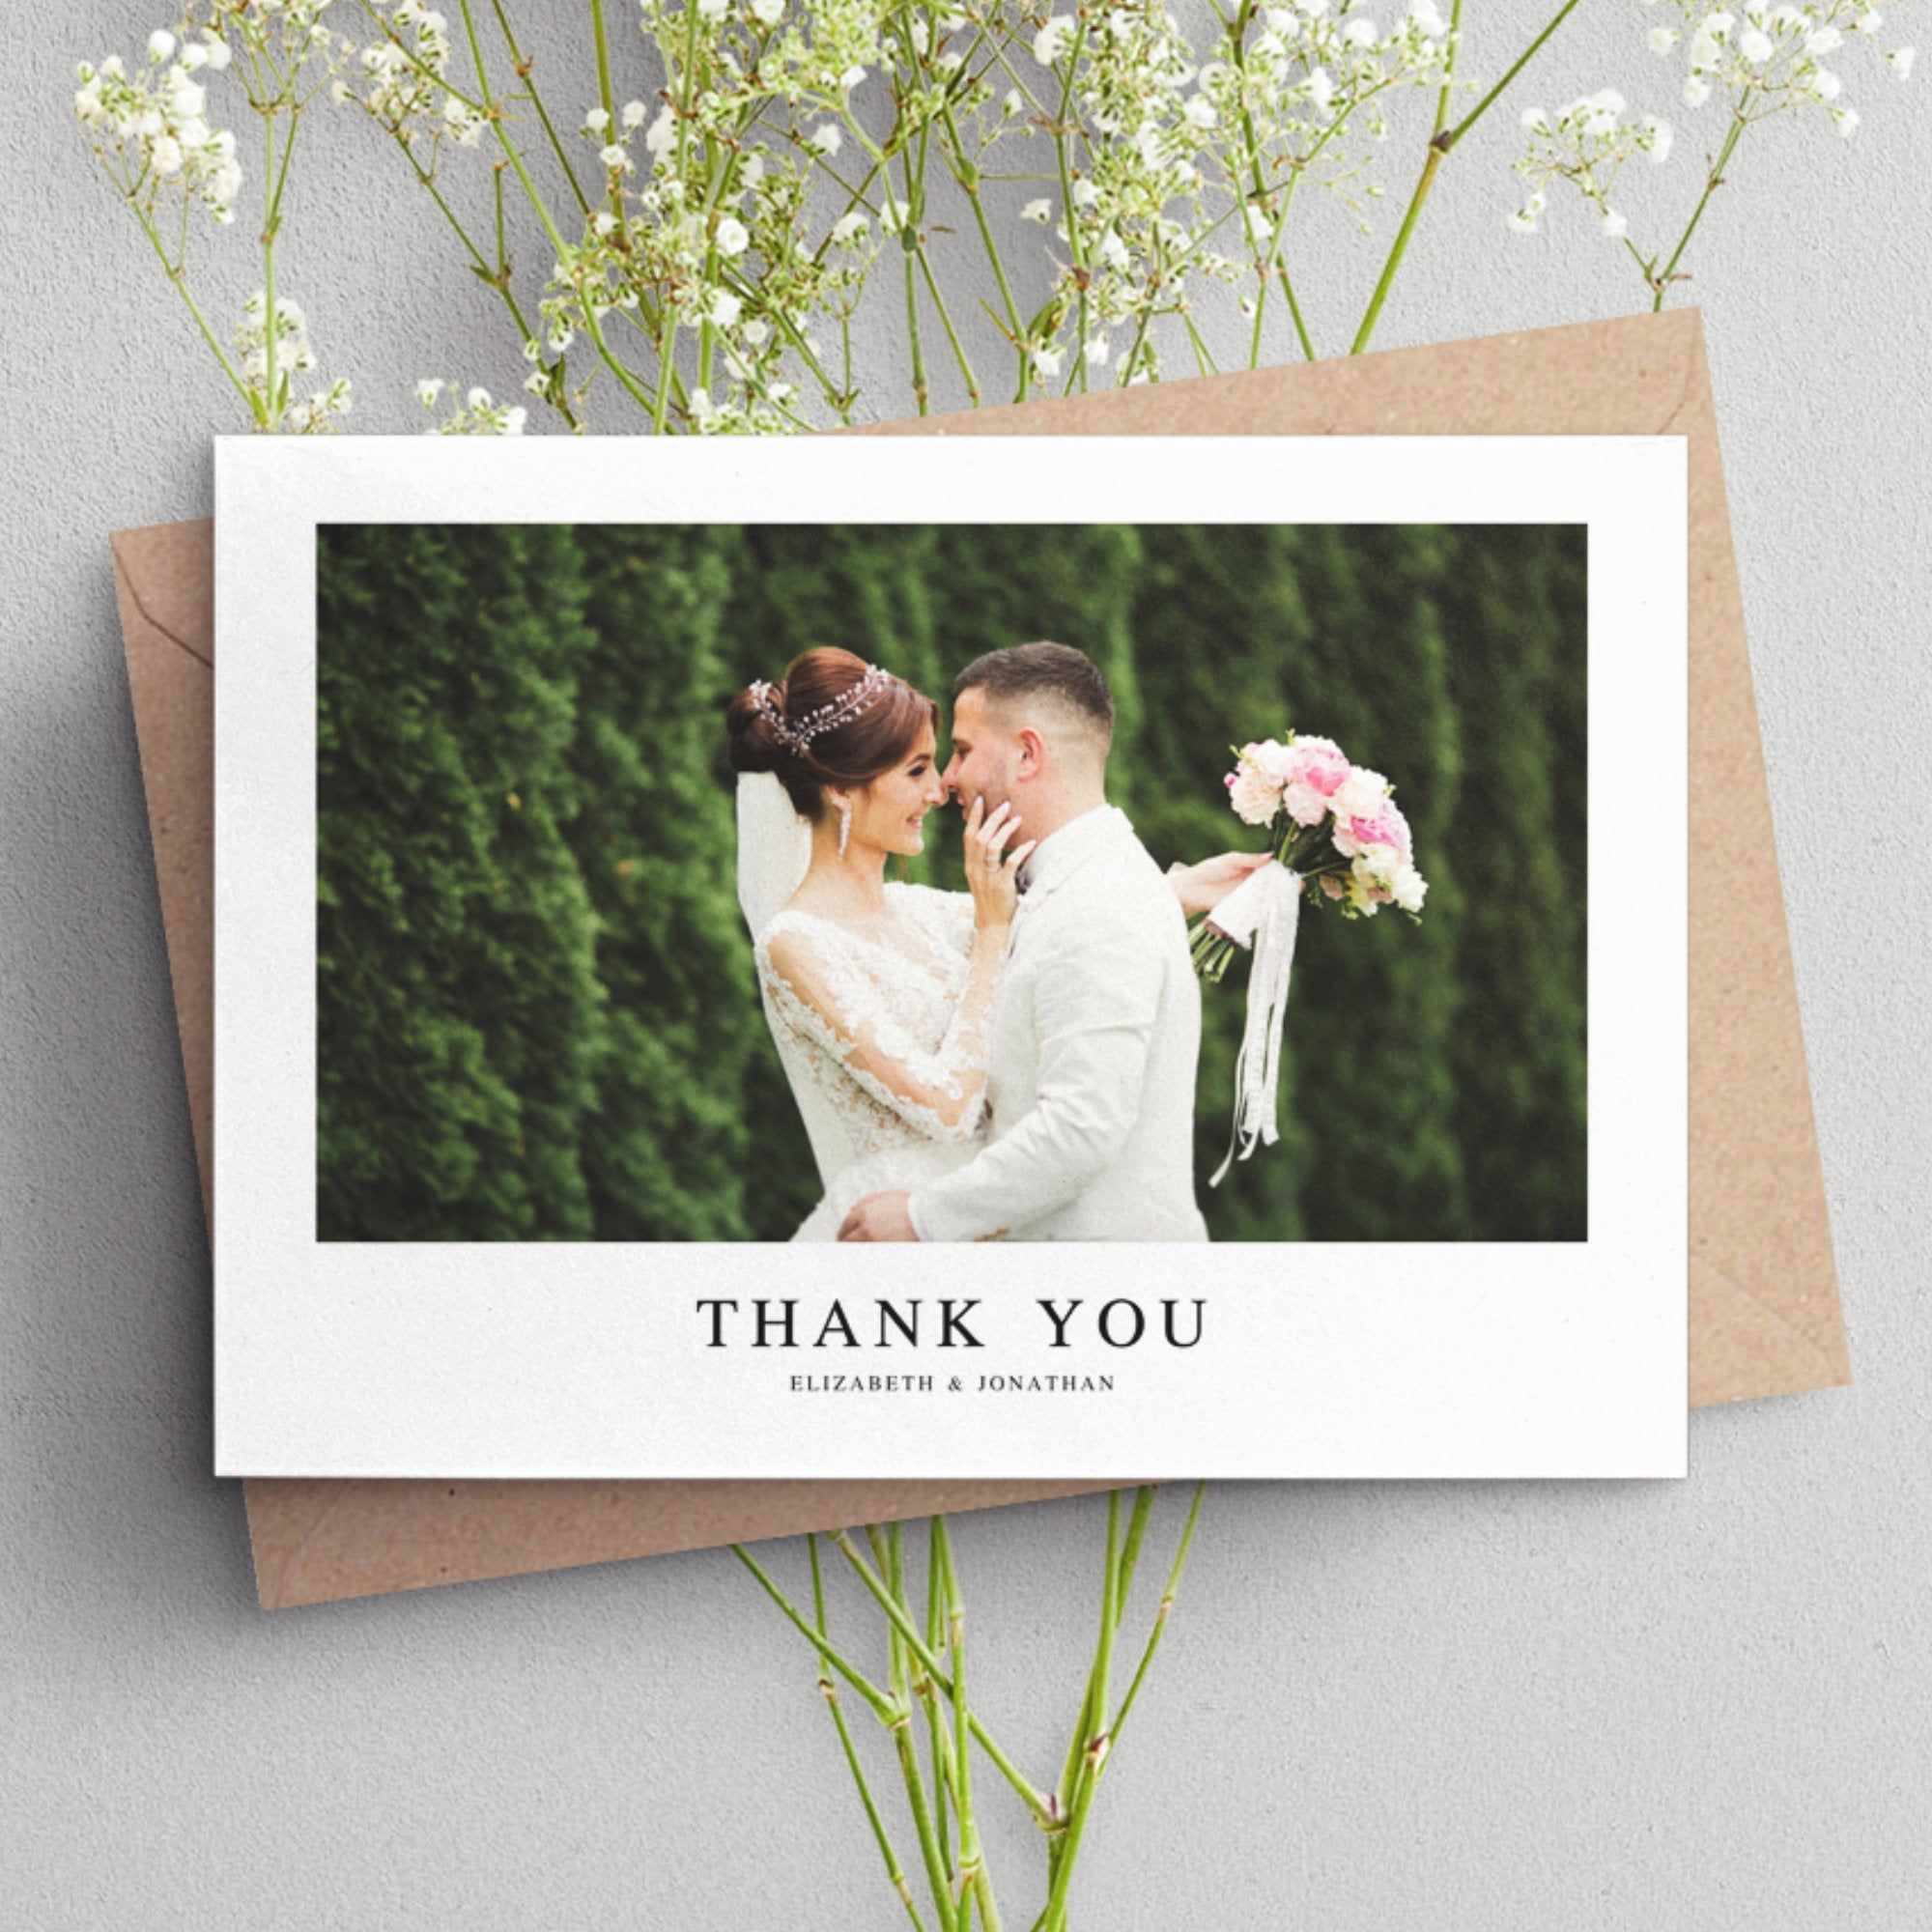 Wedding Thank You Cards With Photo Wedding Photo Thank You Etsy Wedding Thank You Cards Photo Thank You Cards Wedding Thank You